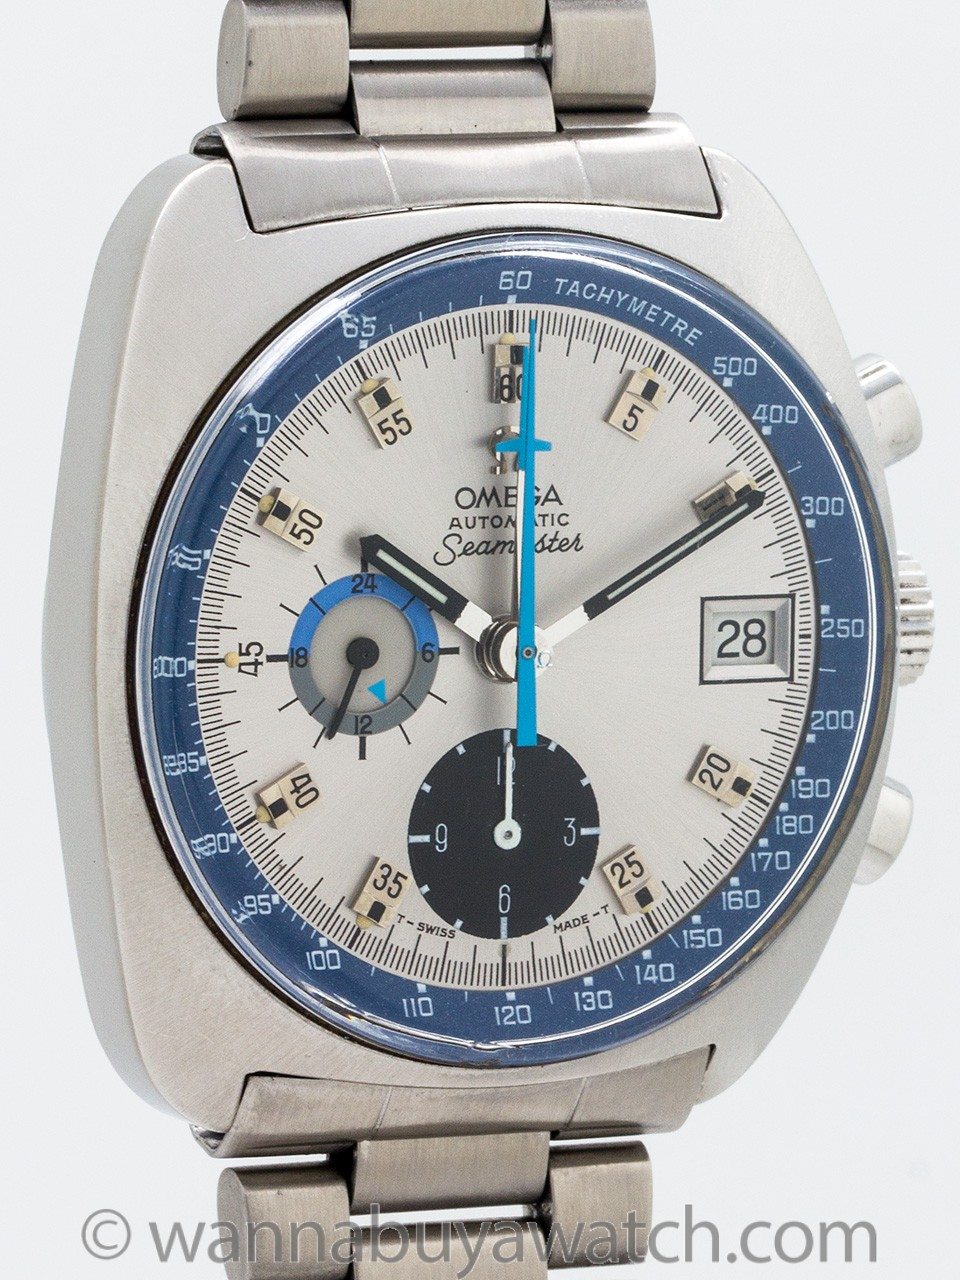 Omega Seamaster Chronograph Automatic circa 1969